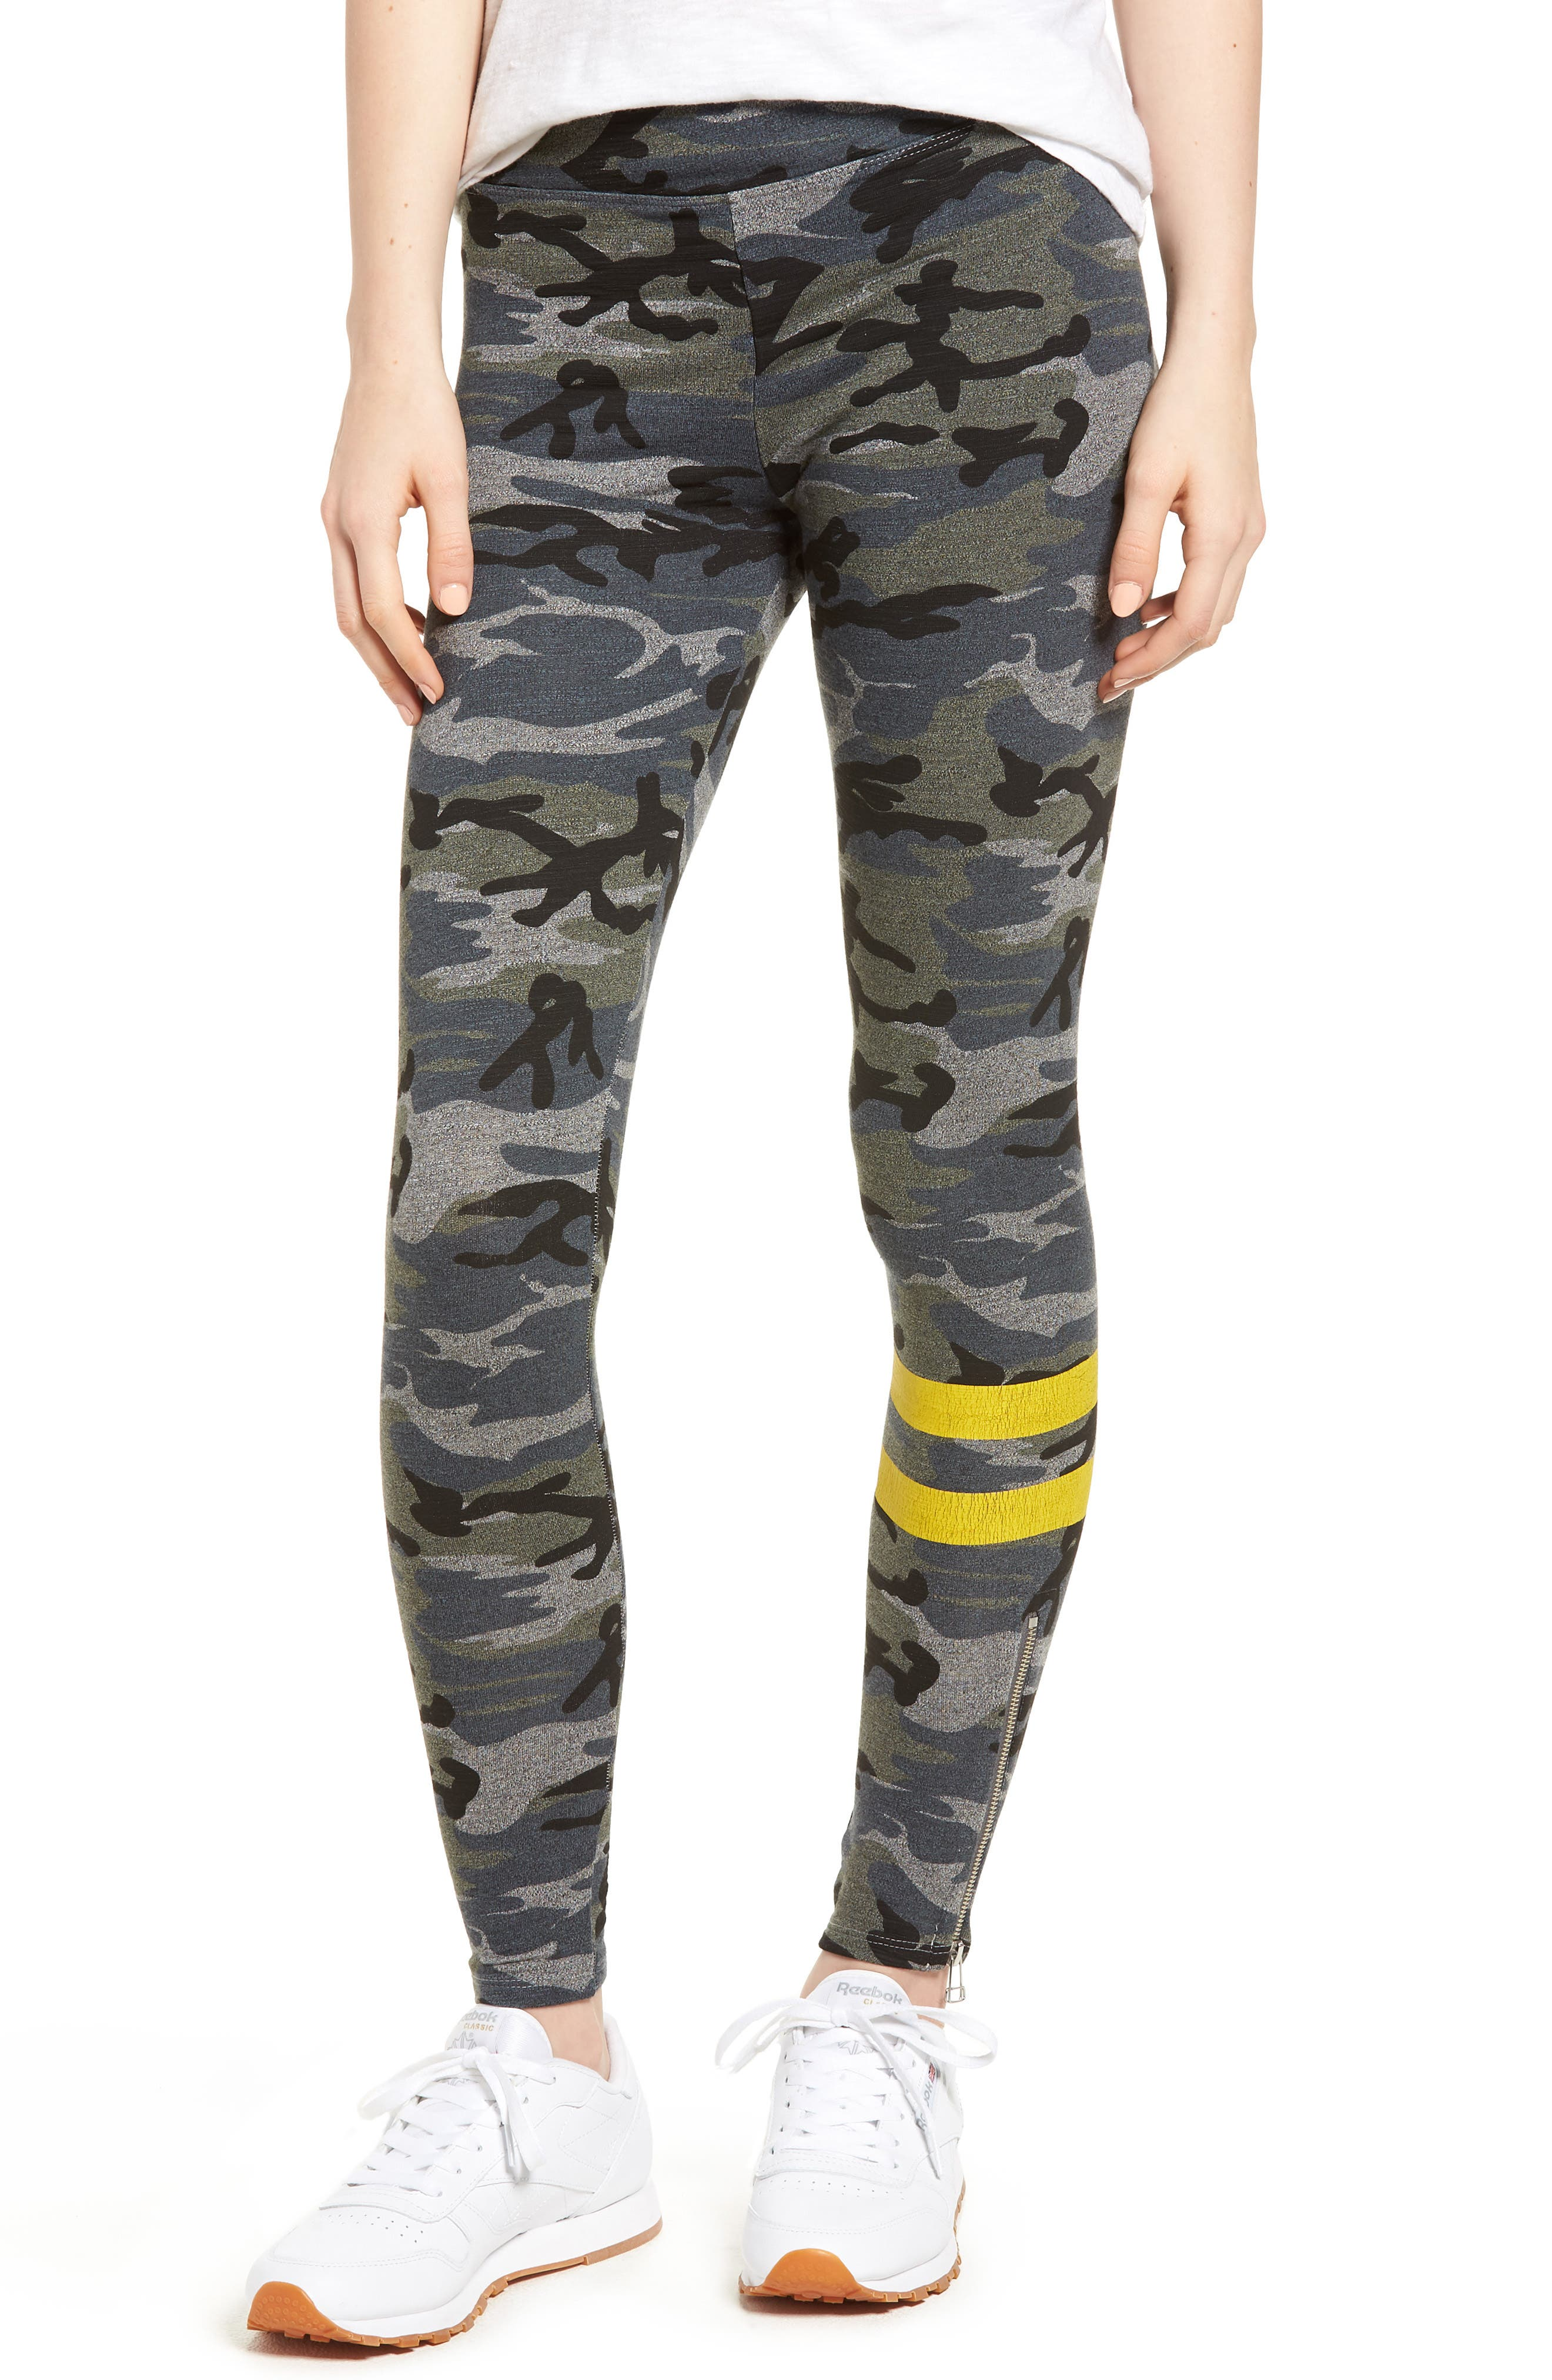 Sundry Stripe Camo Yoga Pants